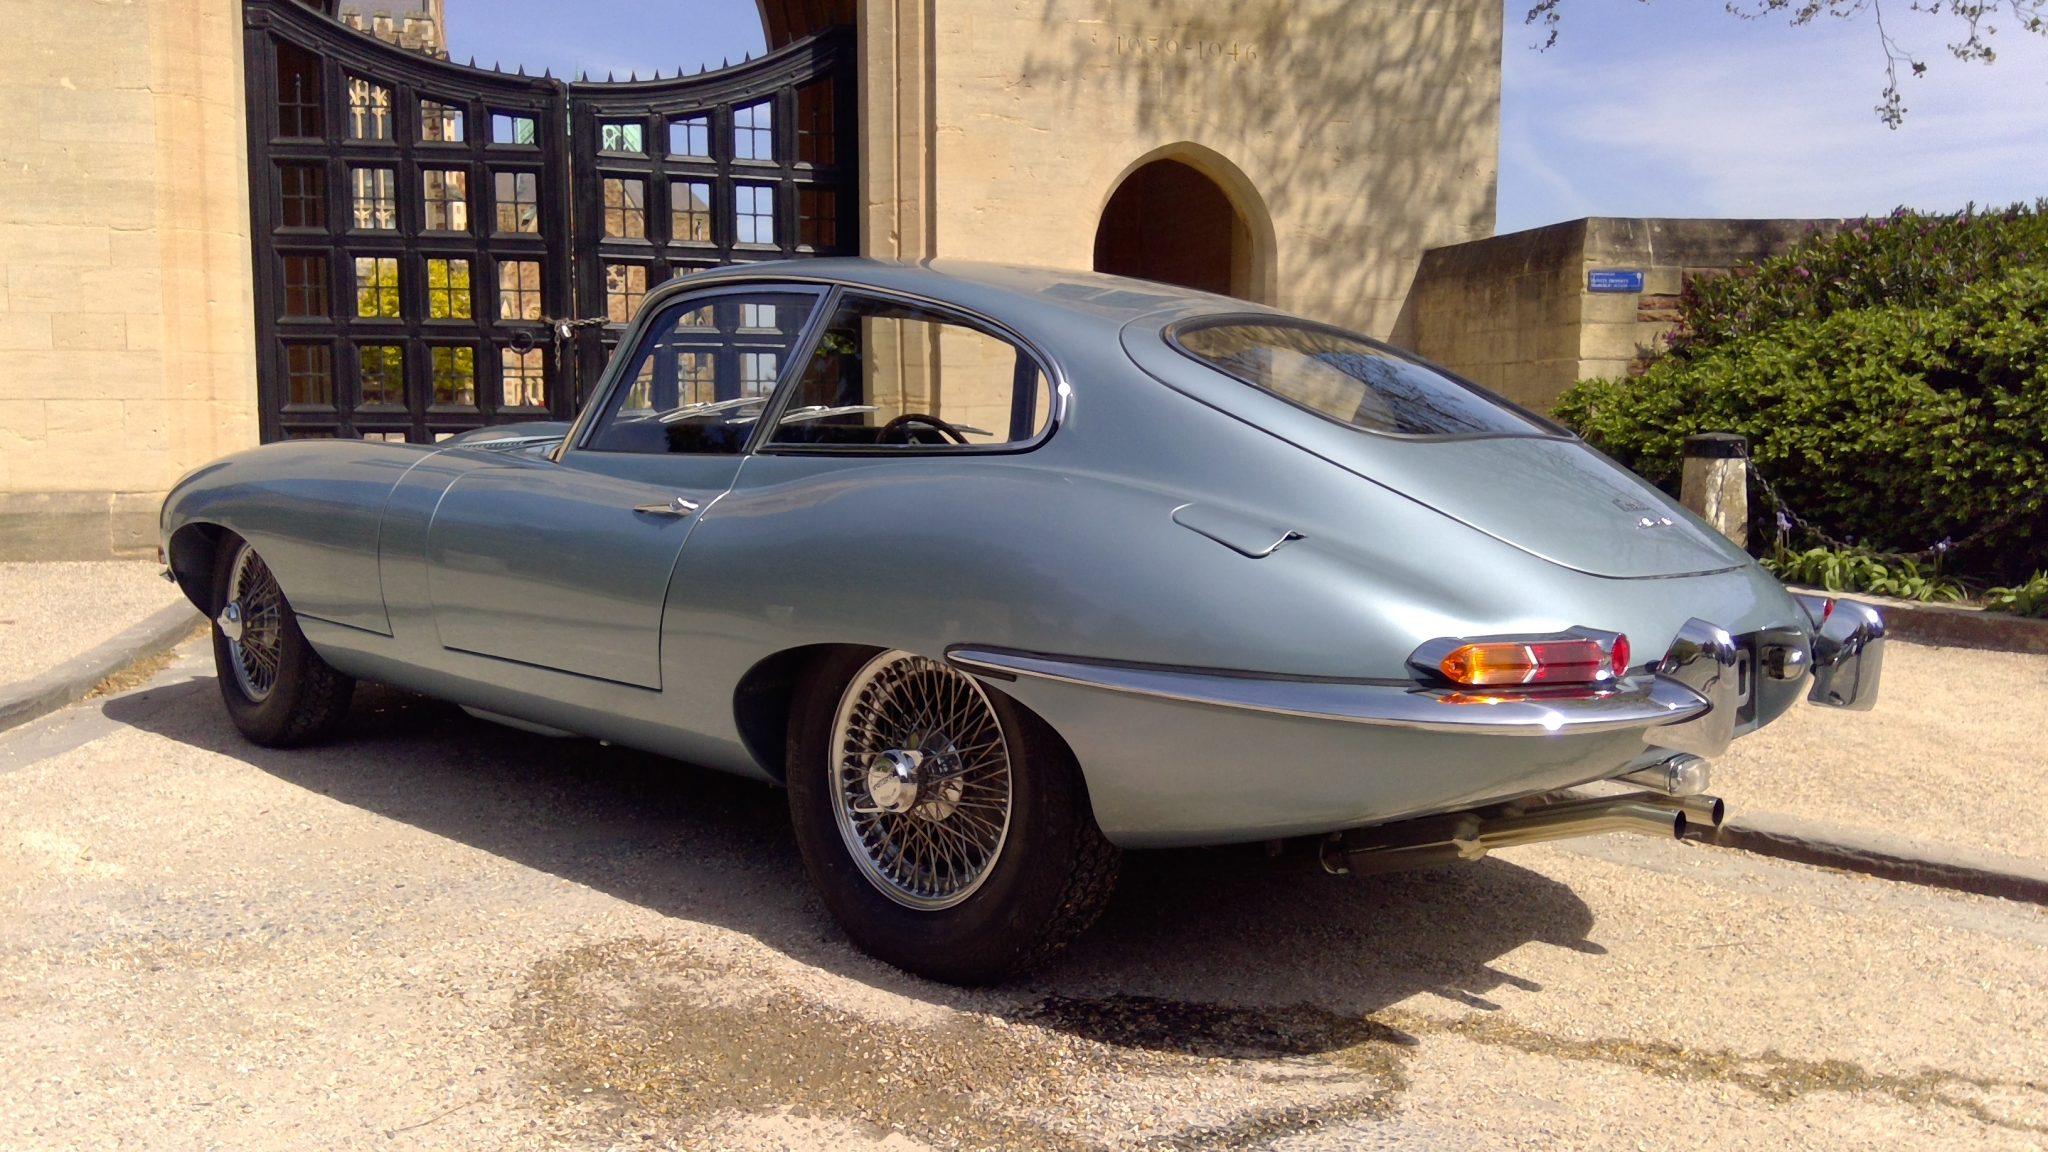 Jaguar E Type Series 1 1966 FHC 4.2